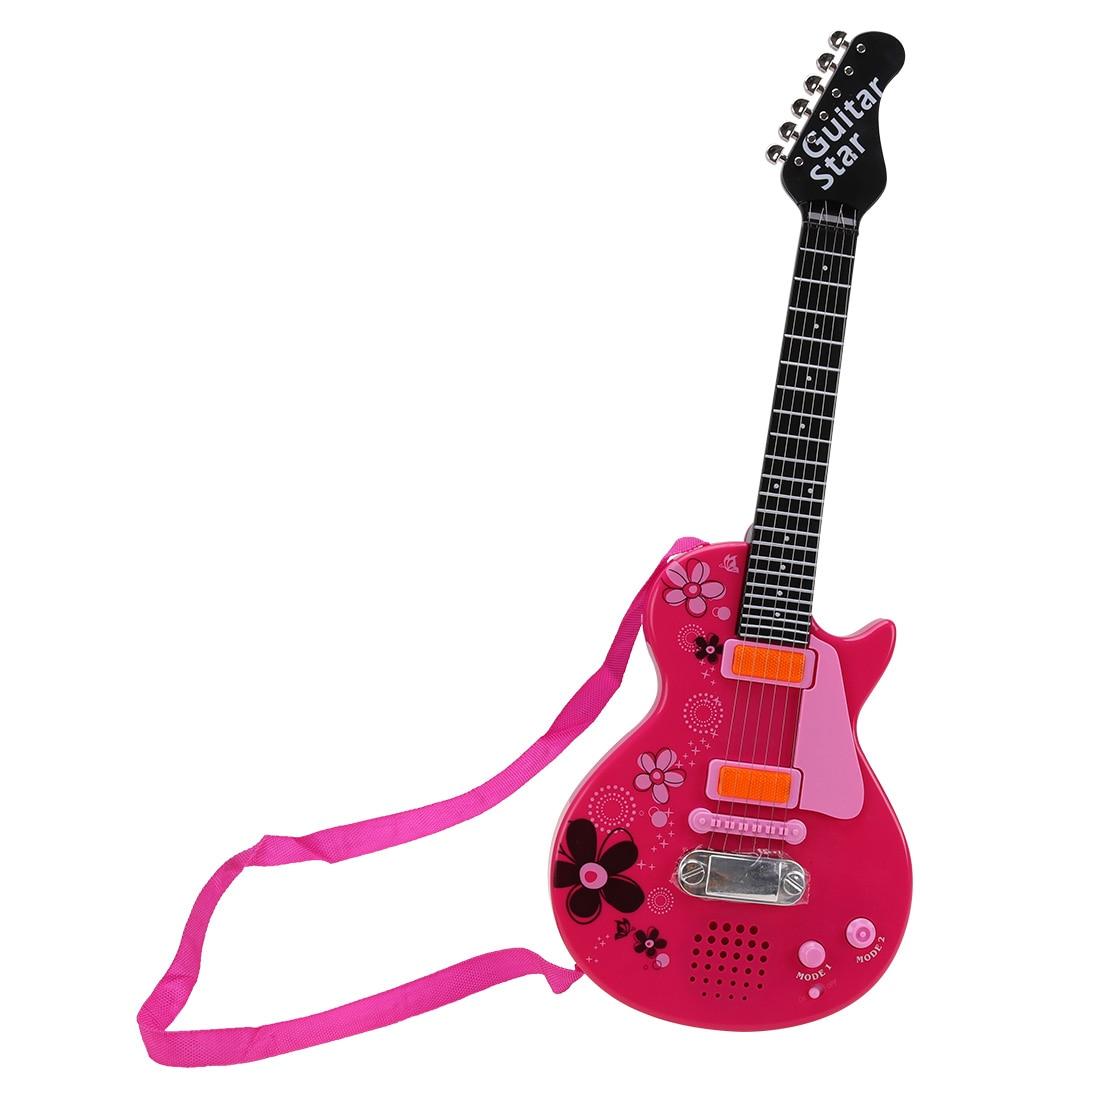 KSL355830 Electric Guitar Musical Instrument Toy For Children - Pink